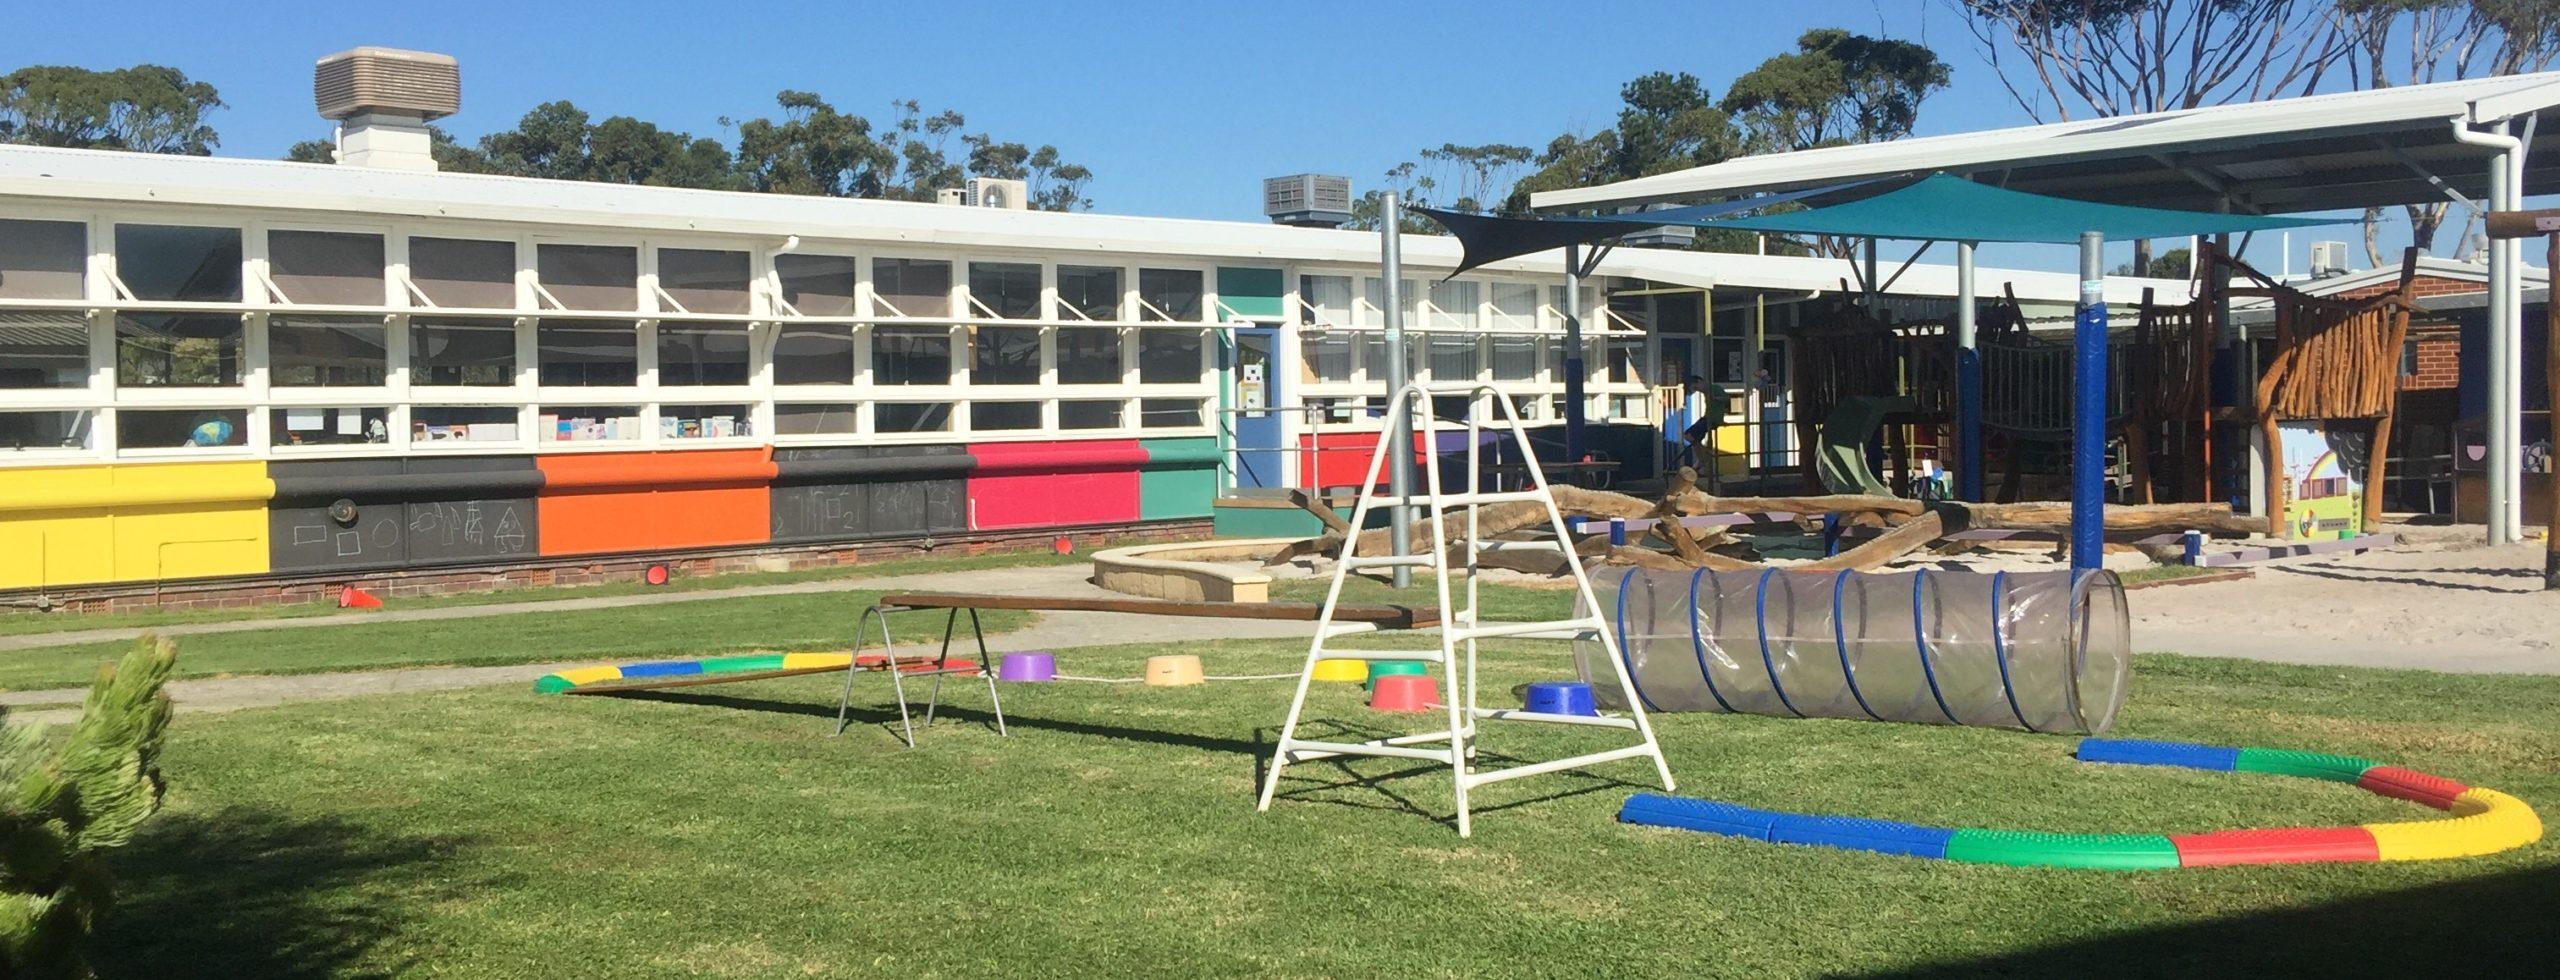 Spencer Park Education Support Centre